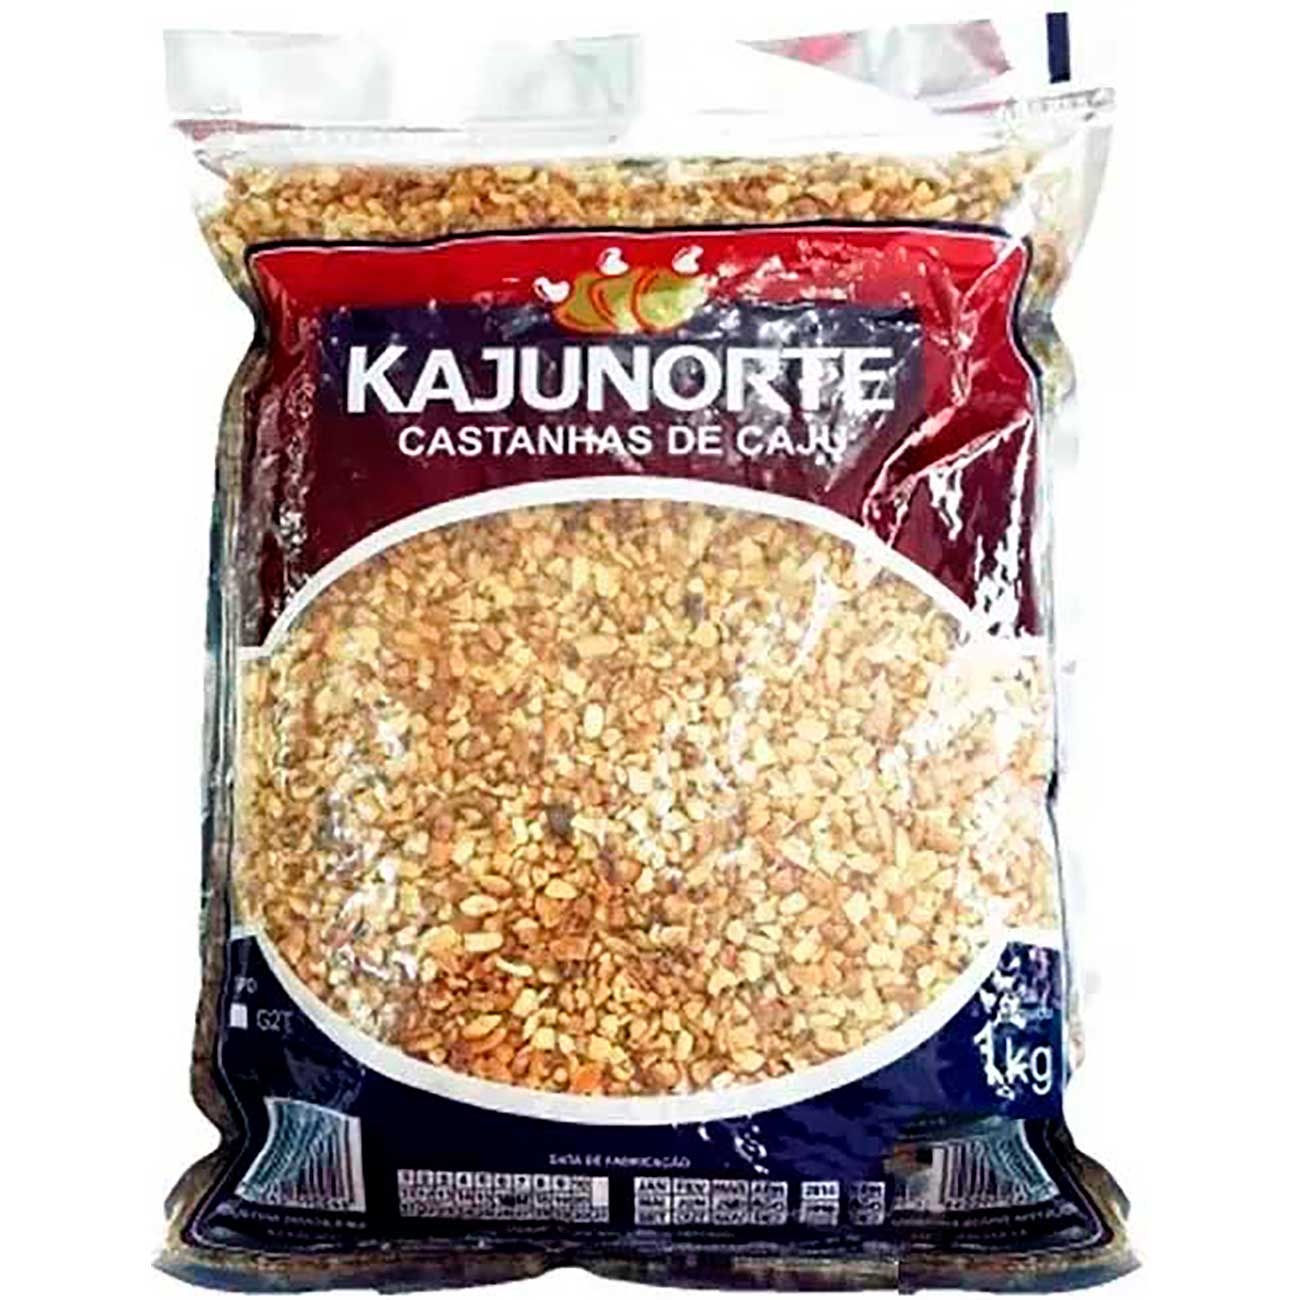 Castanha De Caju Kajunorte ganulado Tipo x2T 1kg